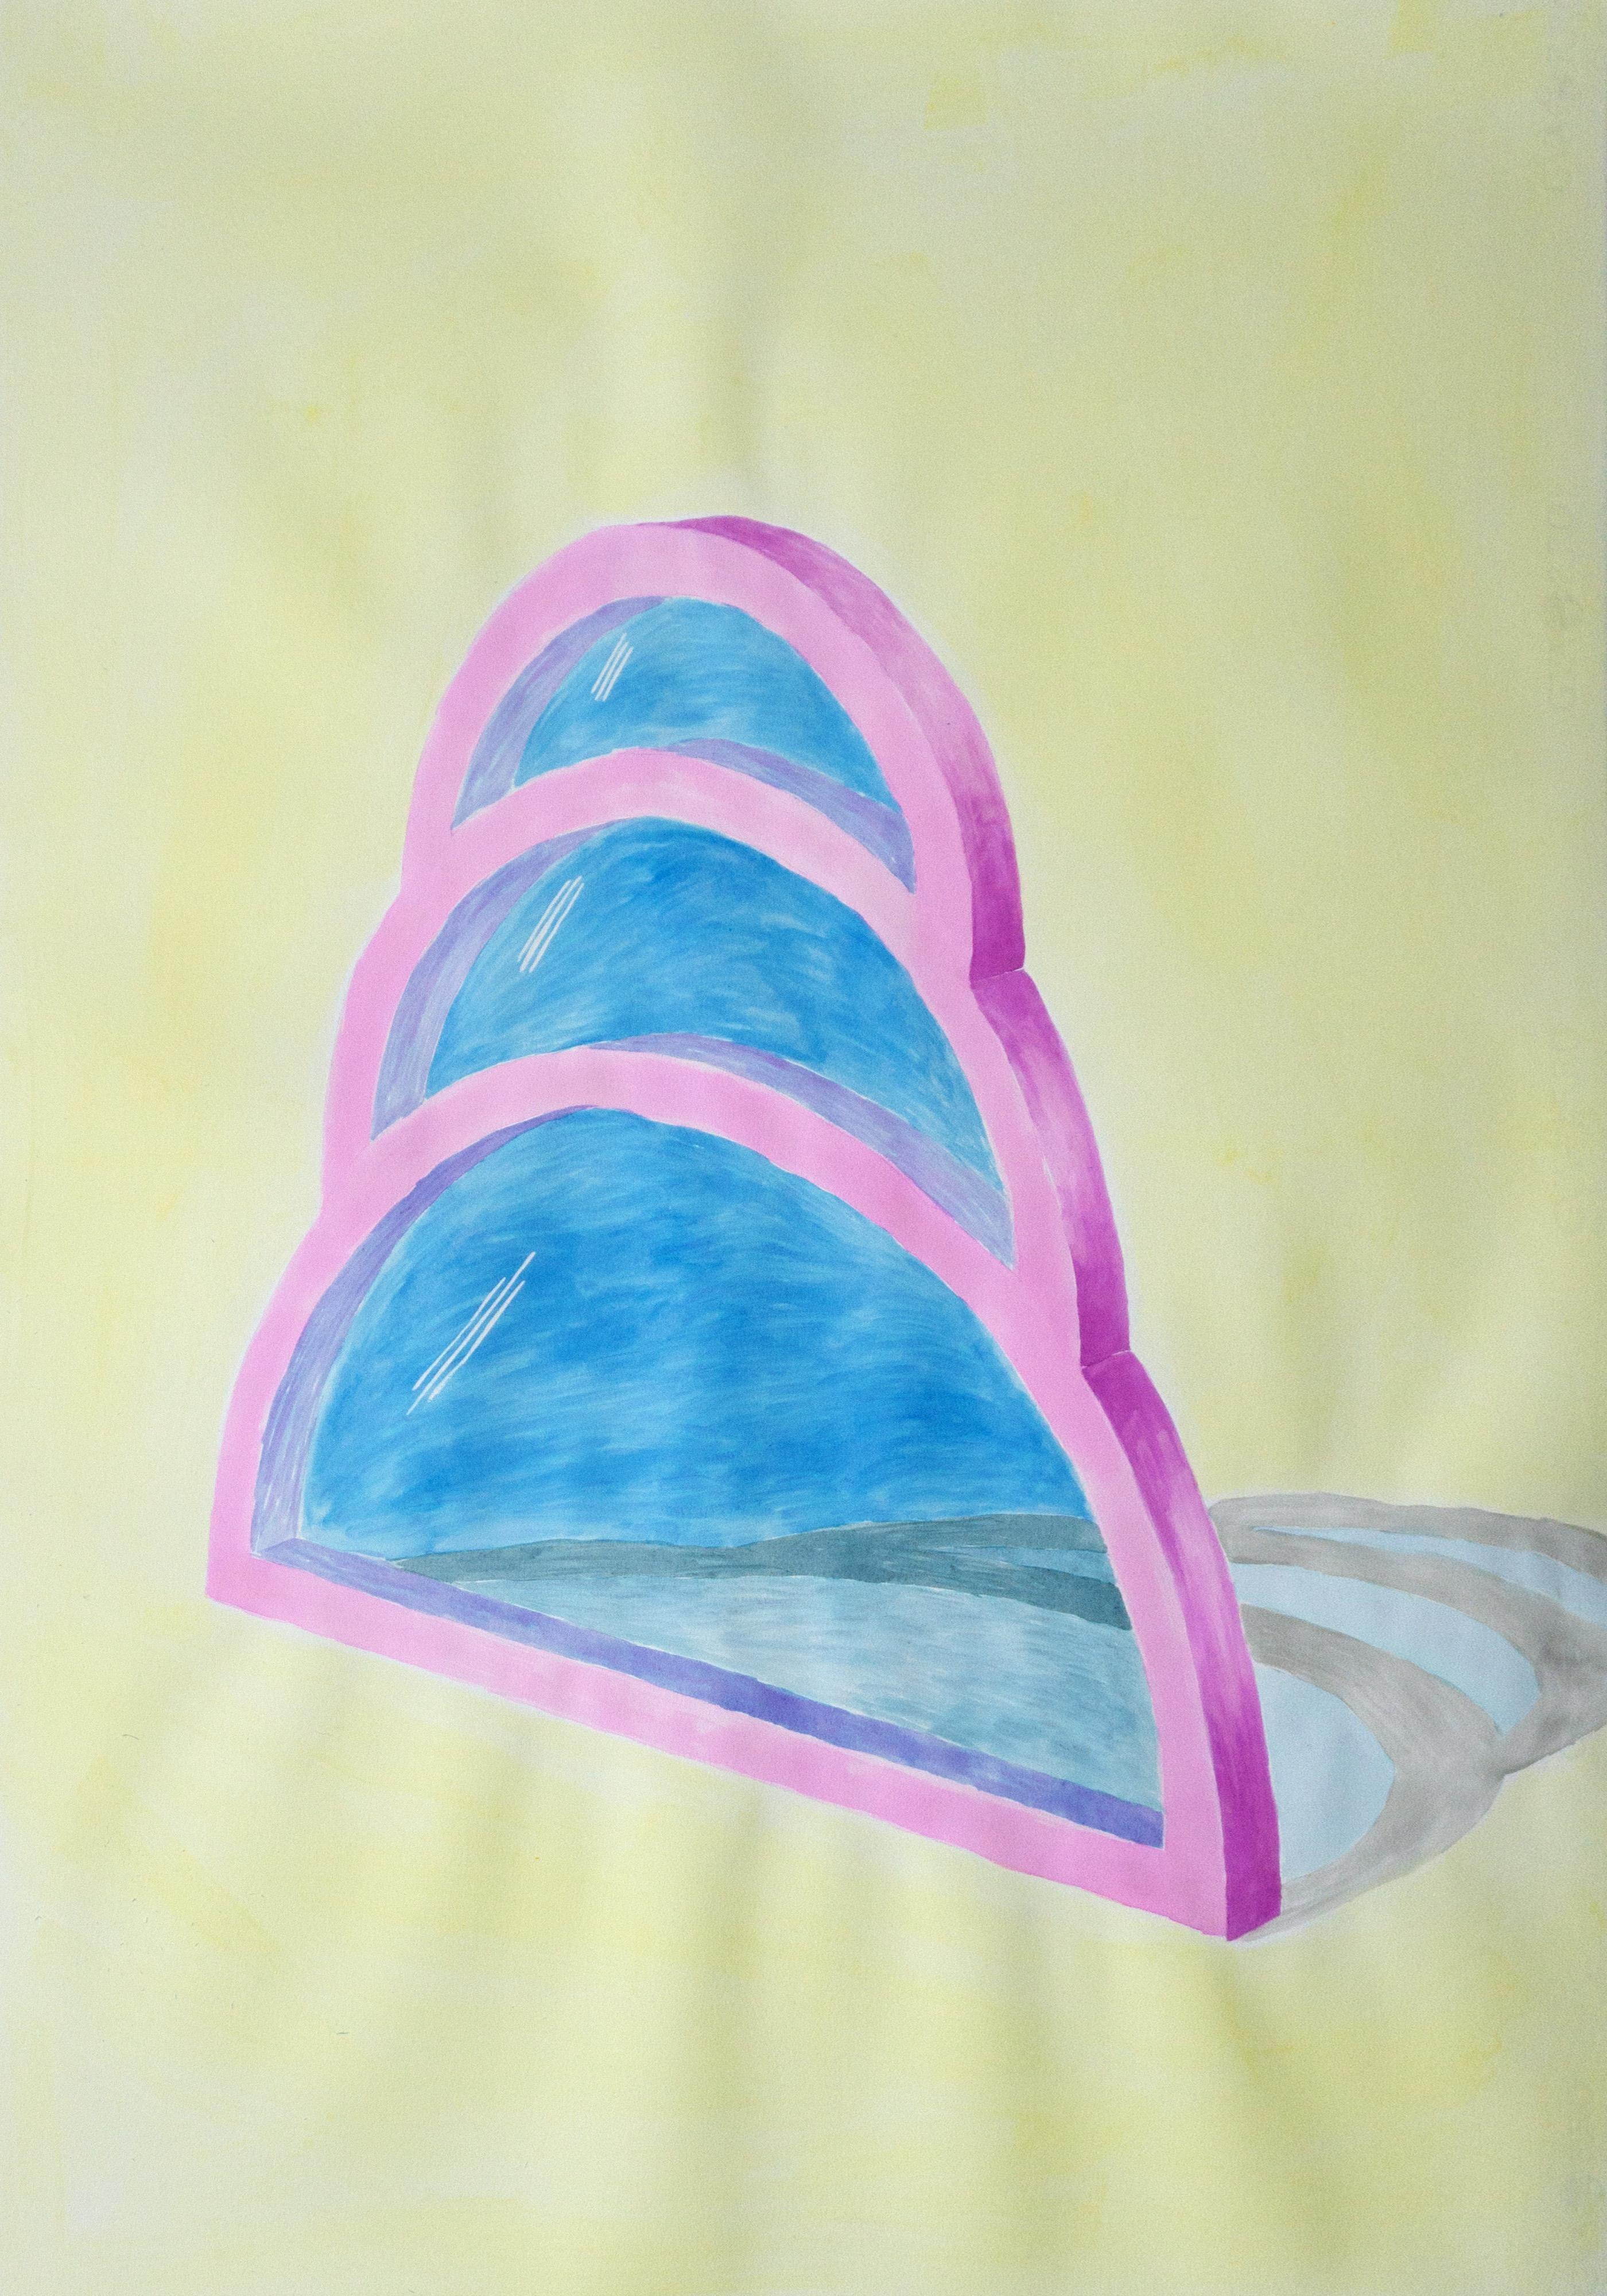 Transparent Teardrop Window, Watercolor on Paper, Yellow, Blue, Pink, Minimal